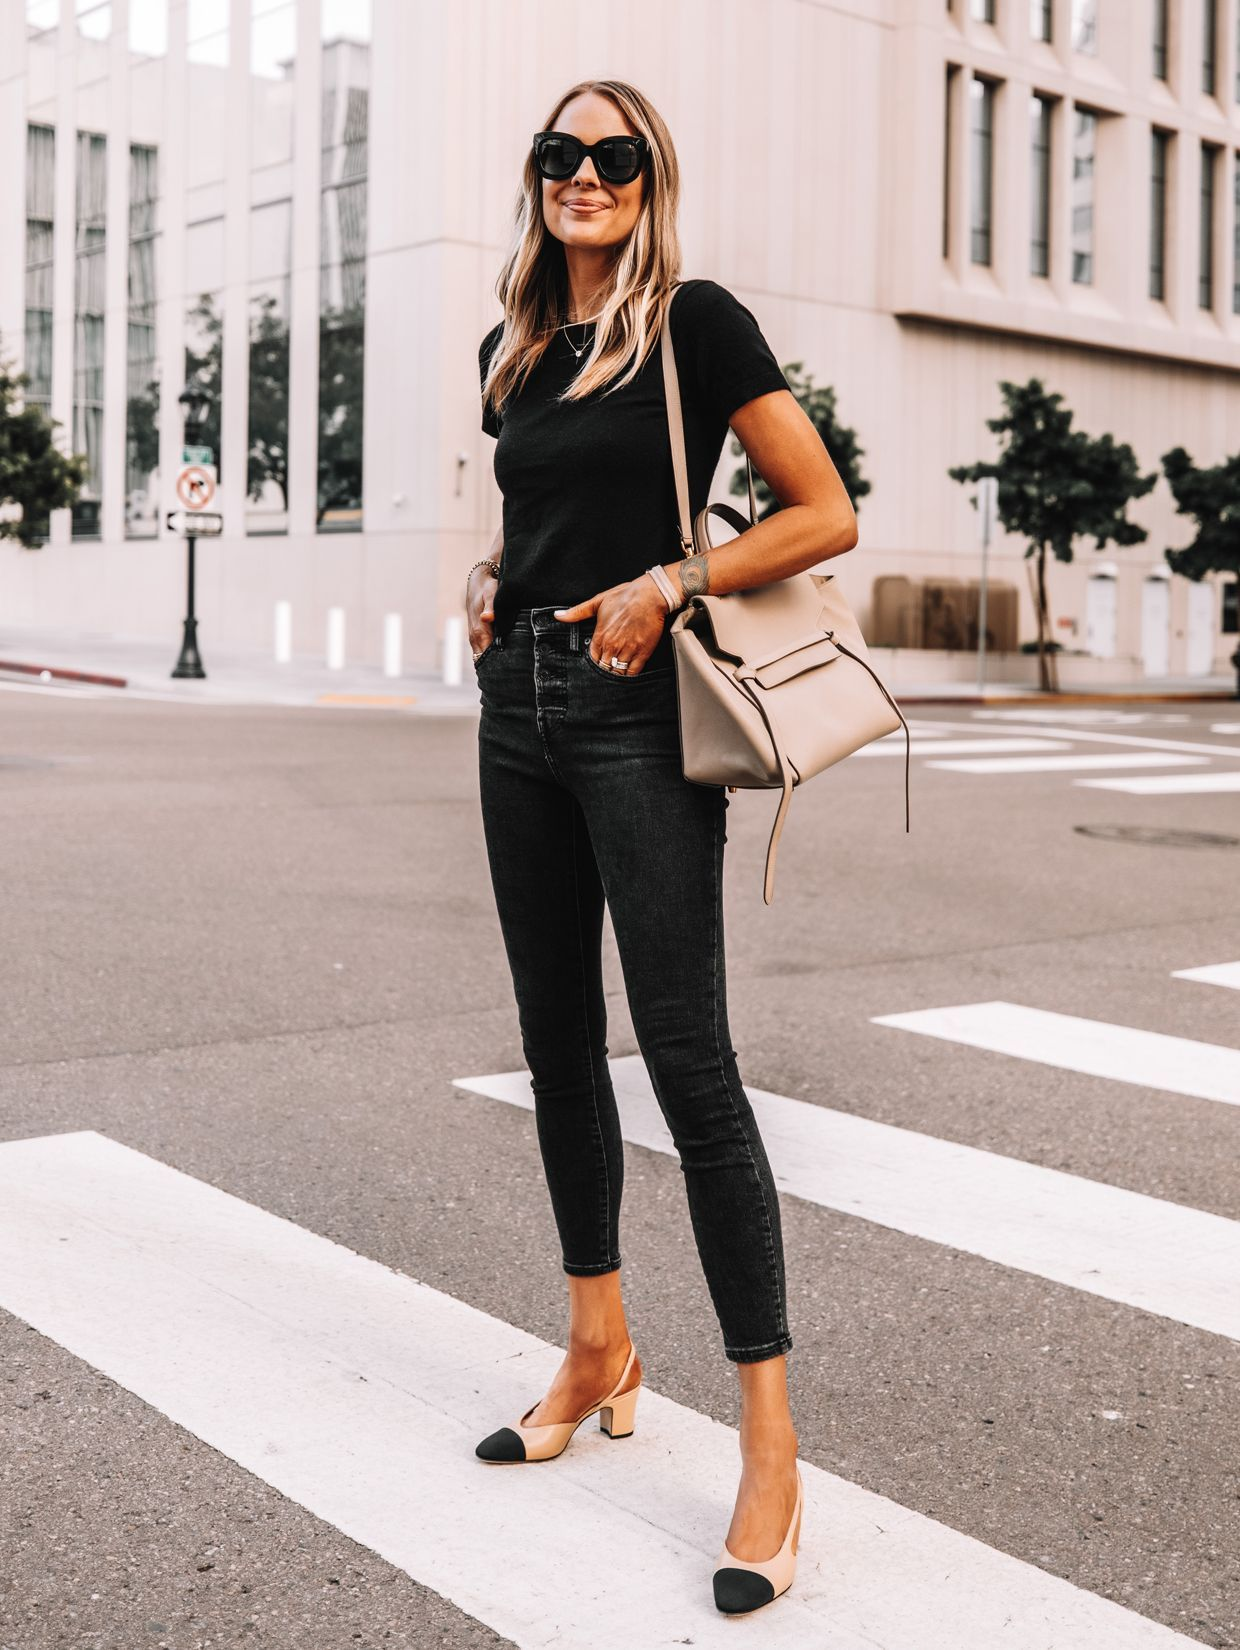 My Honest Review Of The Celine Mini Belt Bag Fashion Jackson Fashion Jackson Fashion Casual Fashion